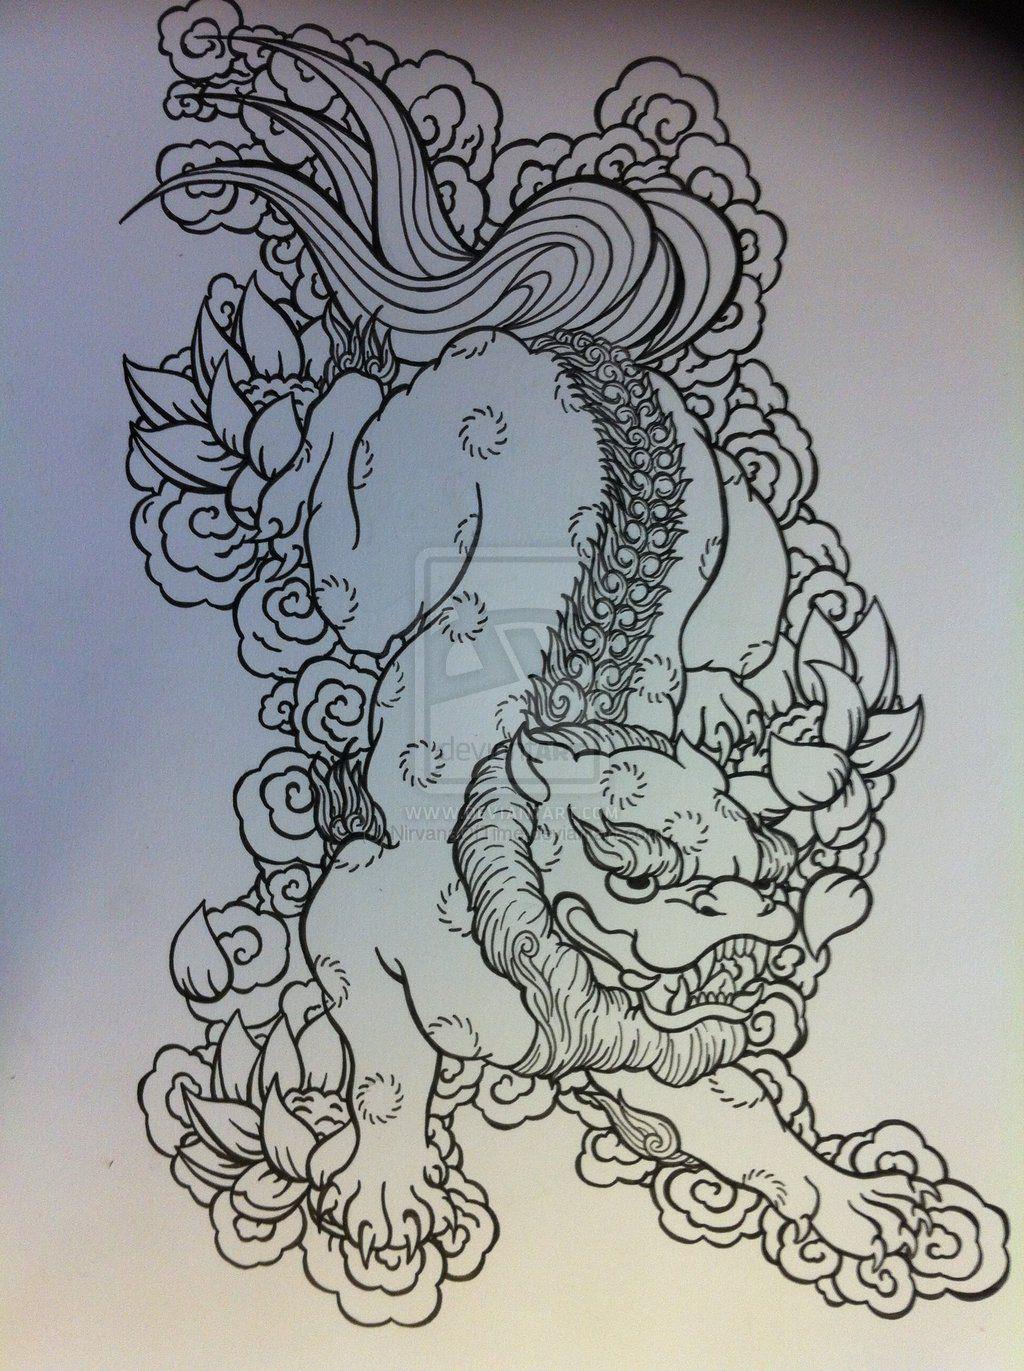 nirvanaoftime guardian lion foo fu dog | Tattoos | Pinterest